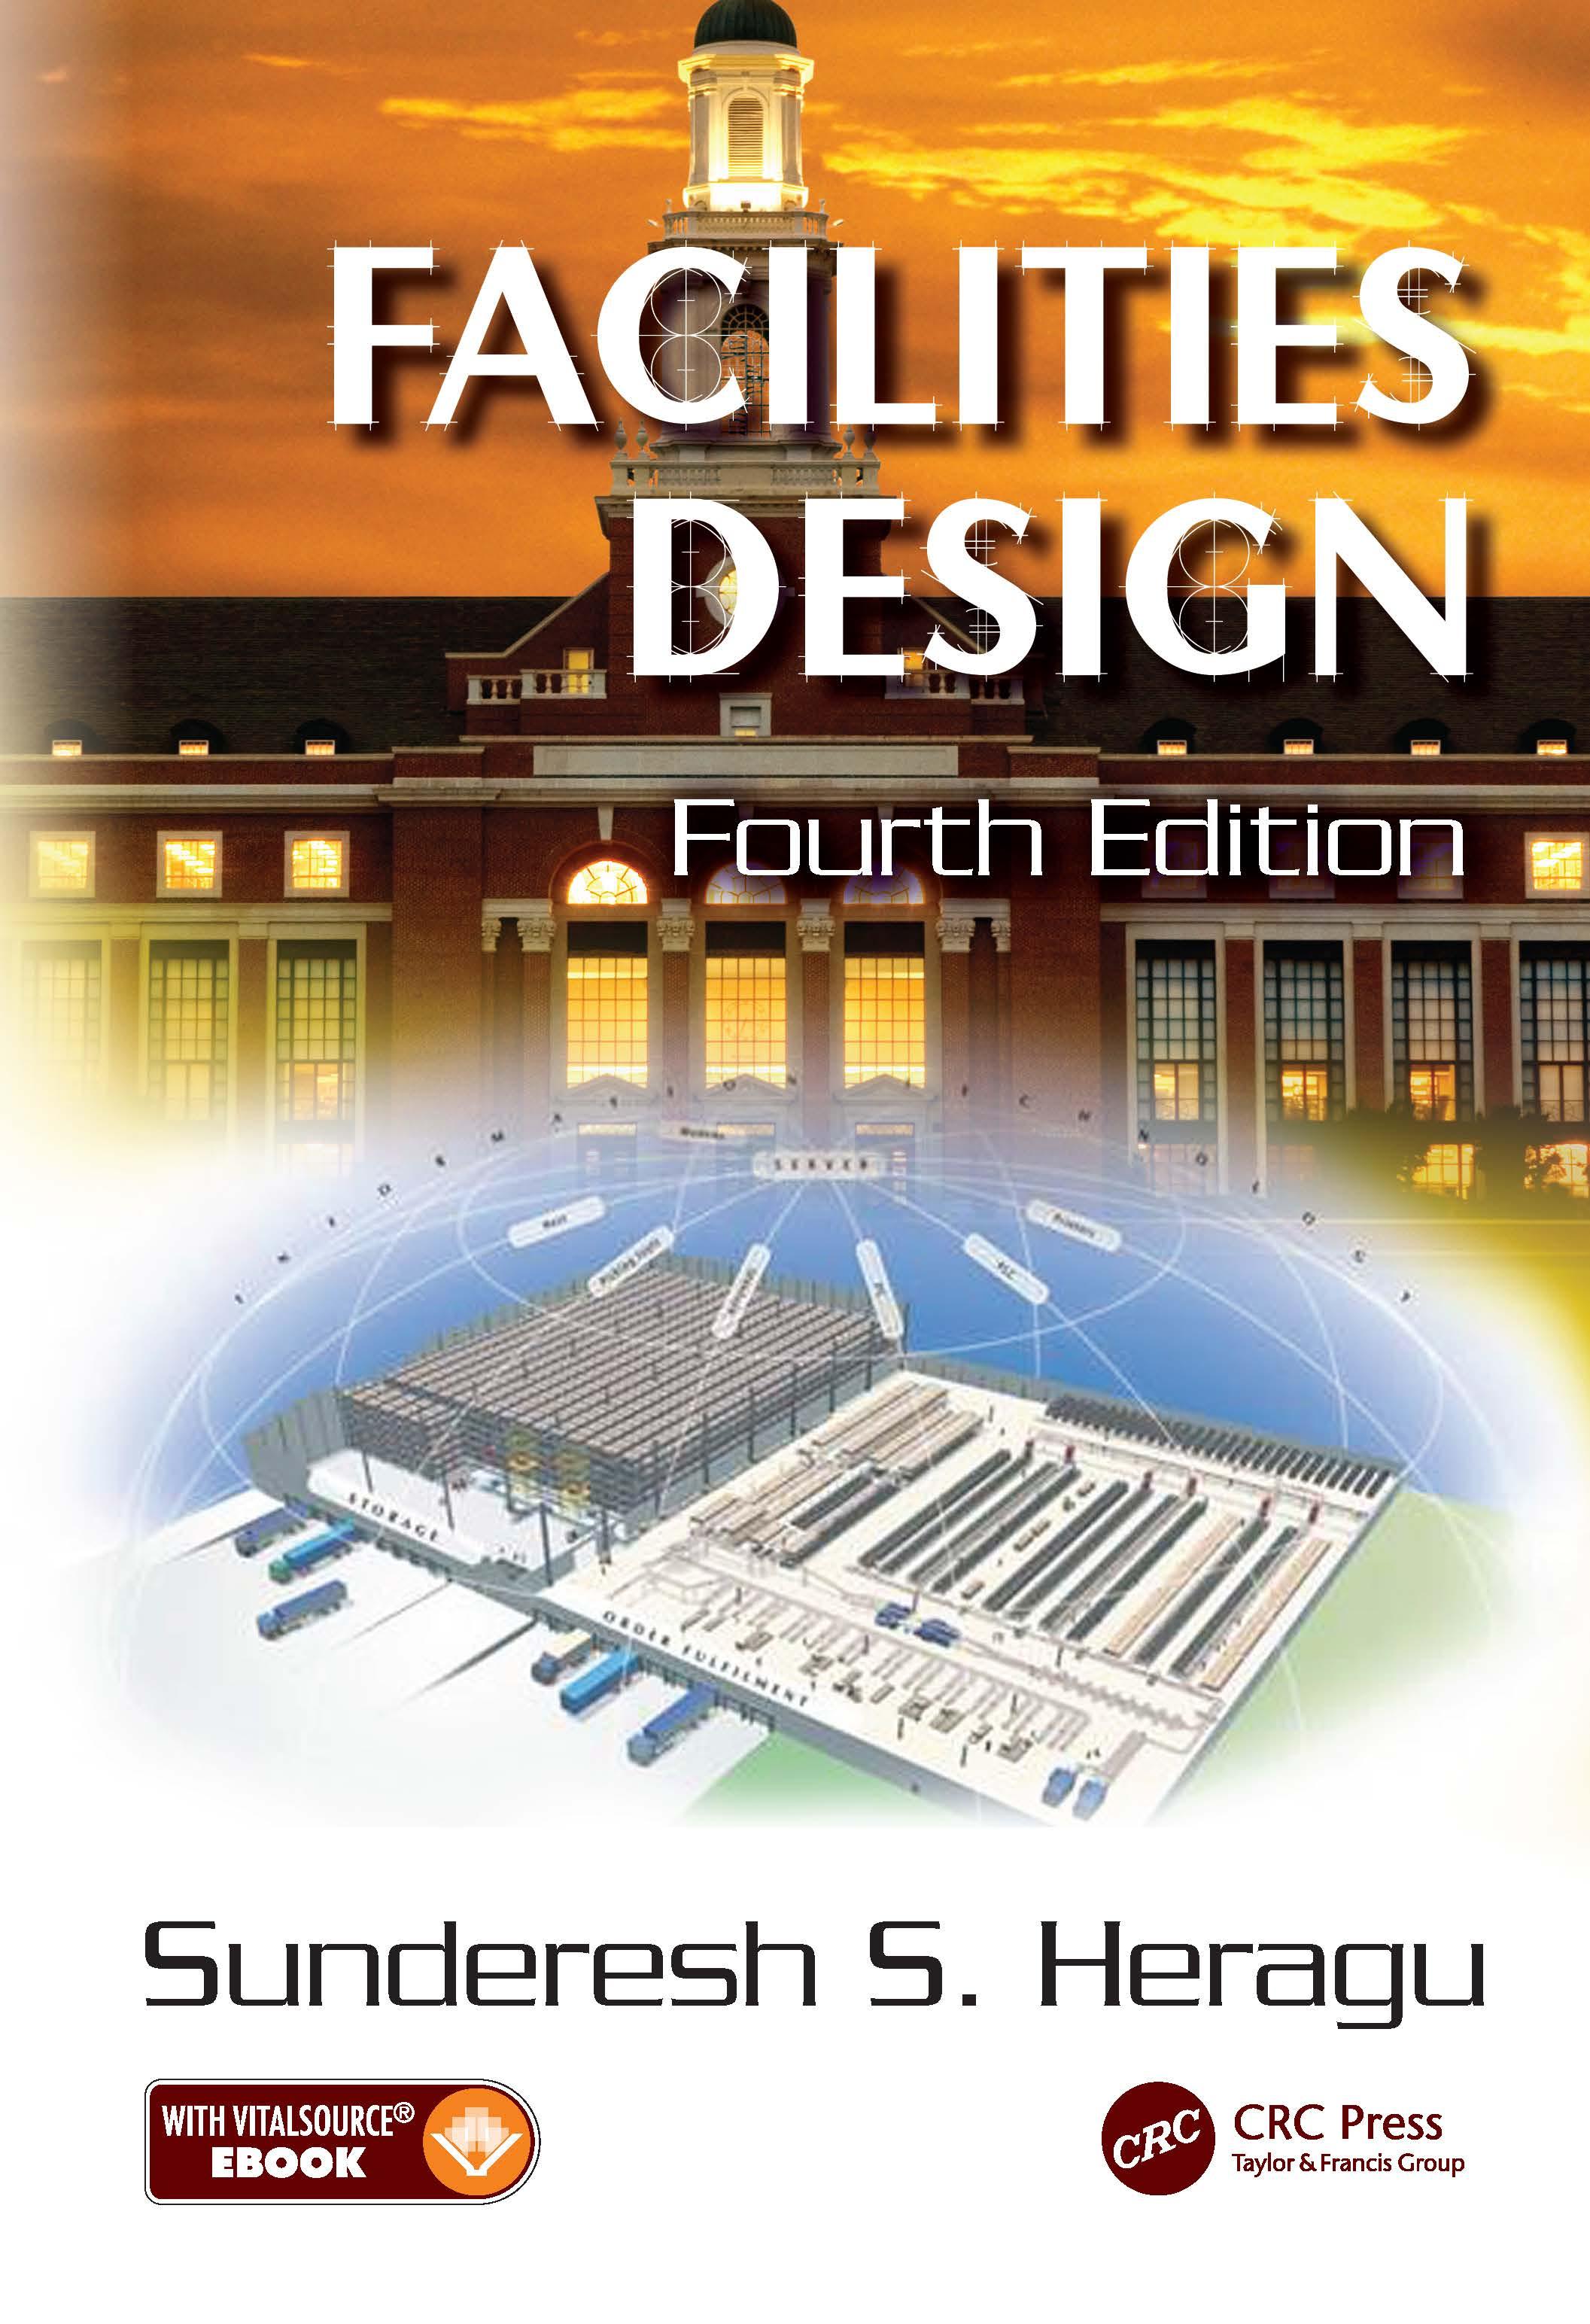 Facilities Design book cover